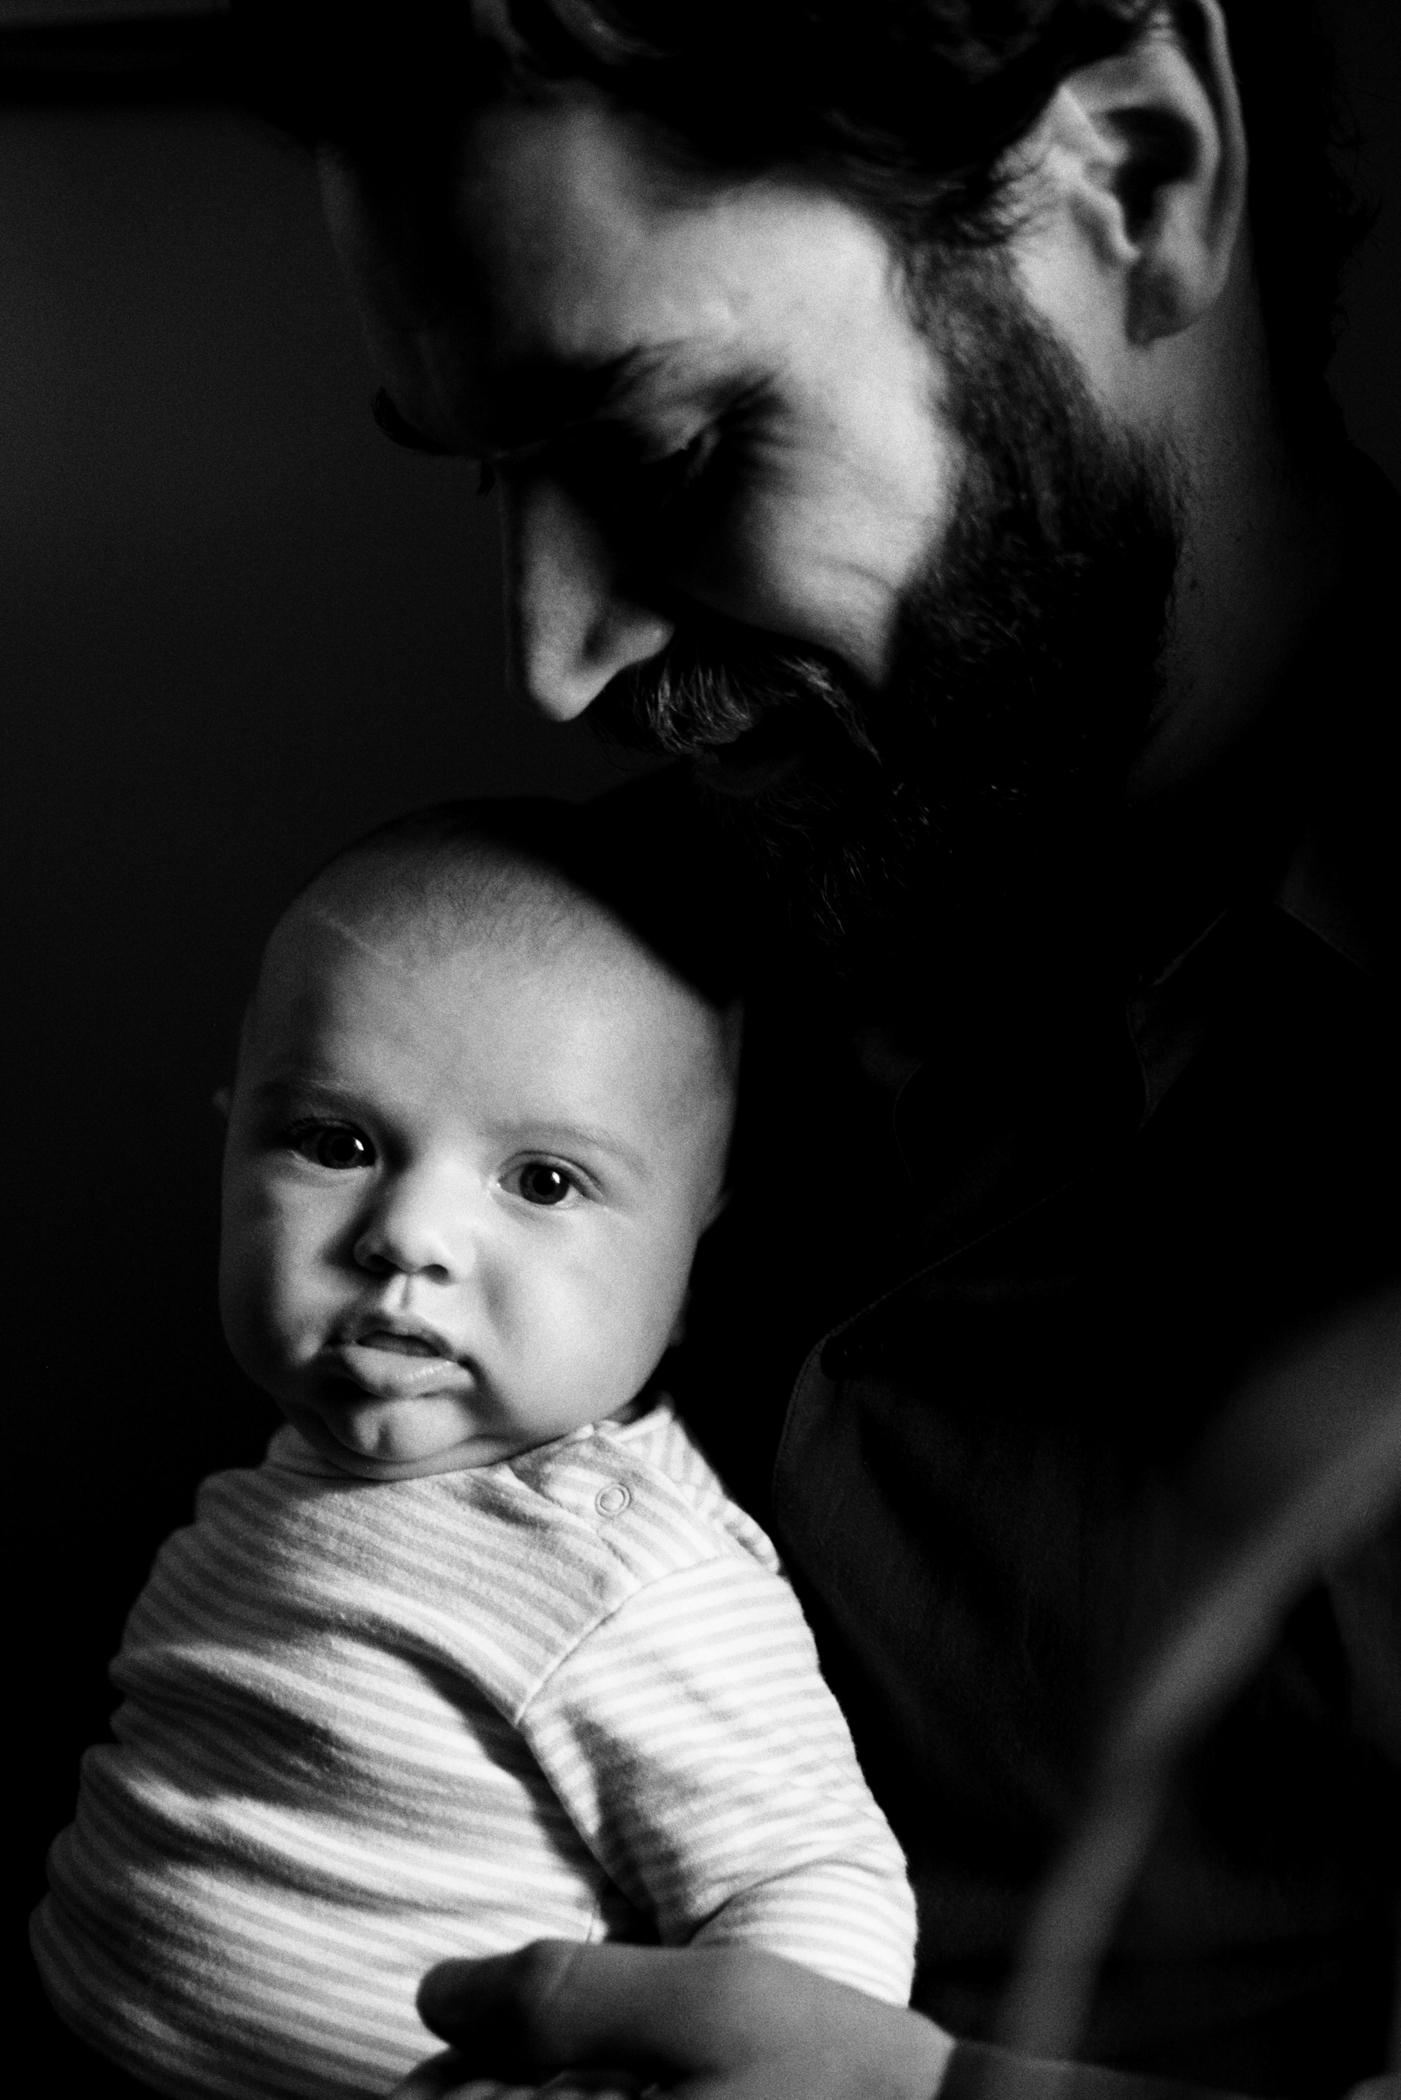 Bebe_toute_annee_Marianne_Charland_photographe_famille_nouveau-ne_enfant_Montreal_Basse-5.jpg